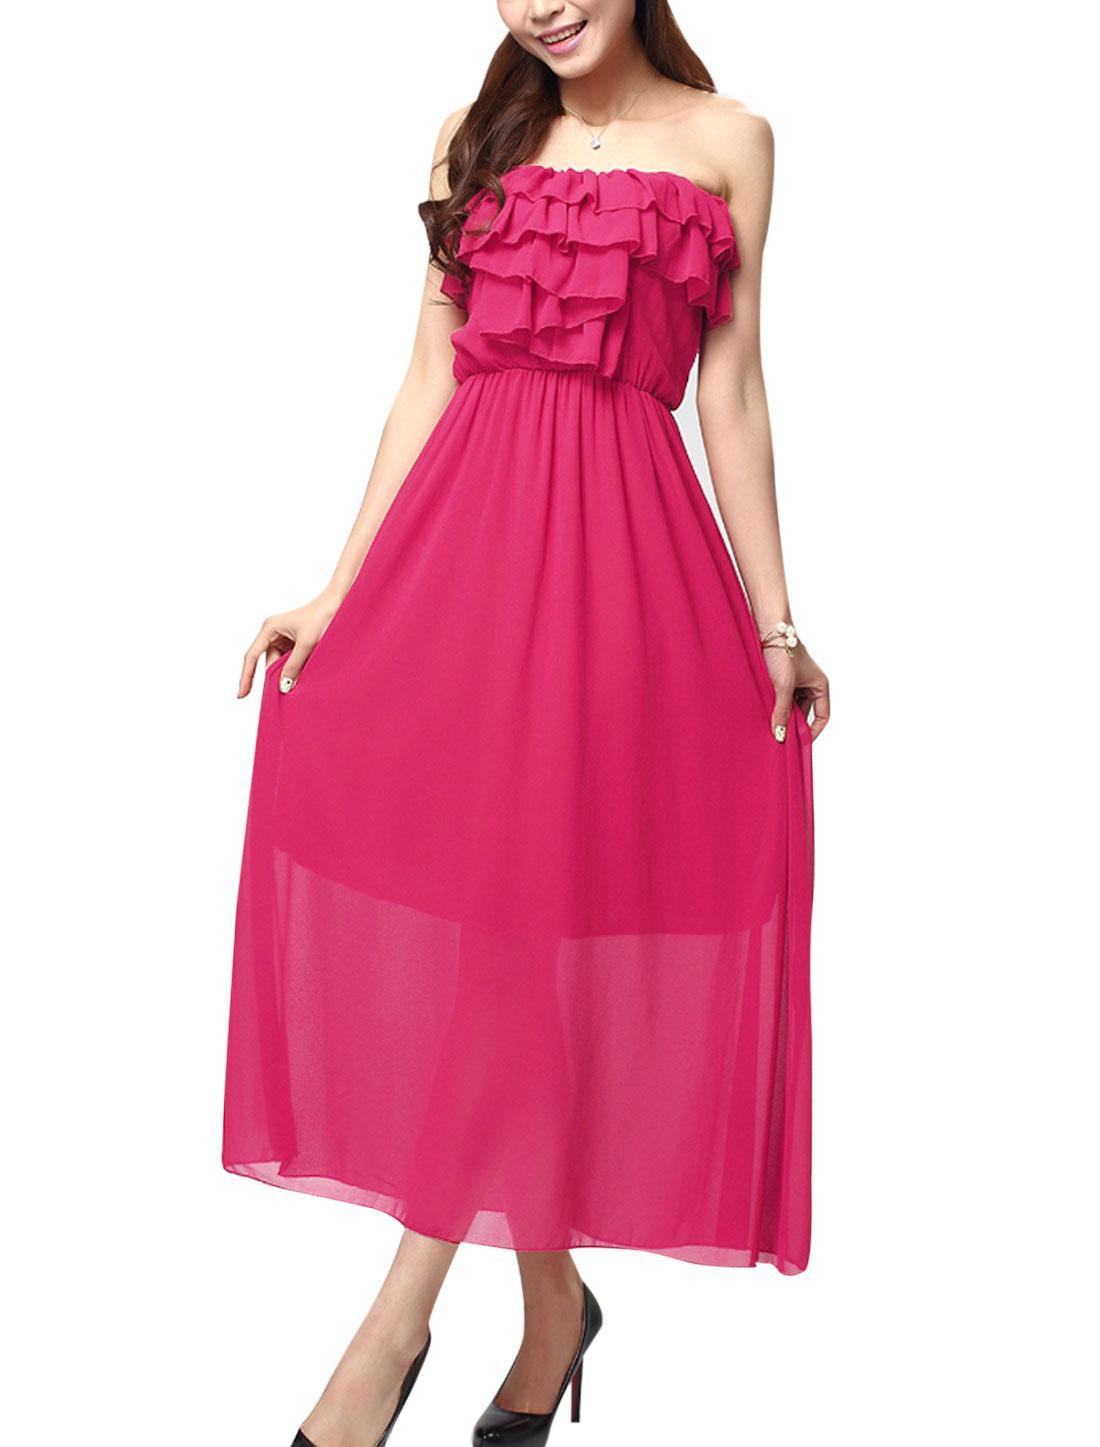 Women Ruffled Embellished Upper Full Length Sexy Corset Dress Fuchsia XS